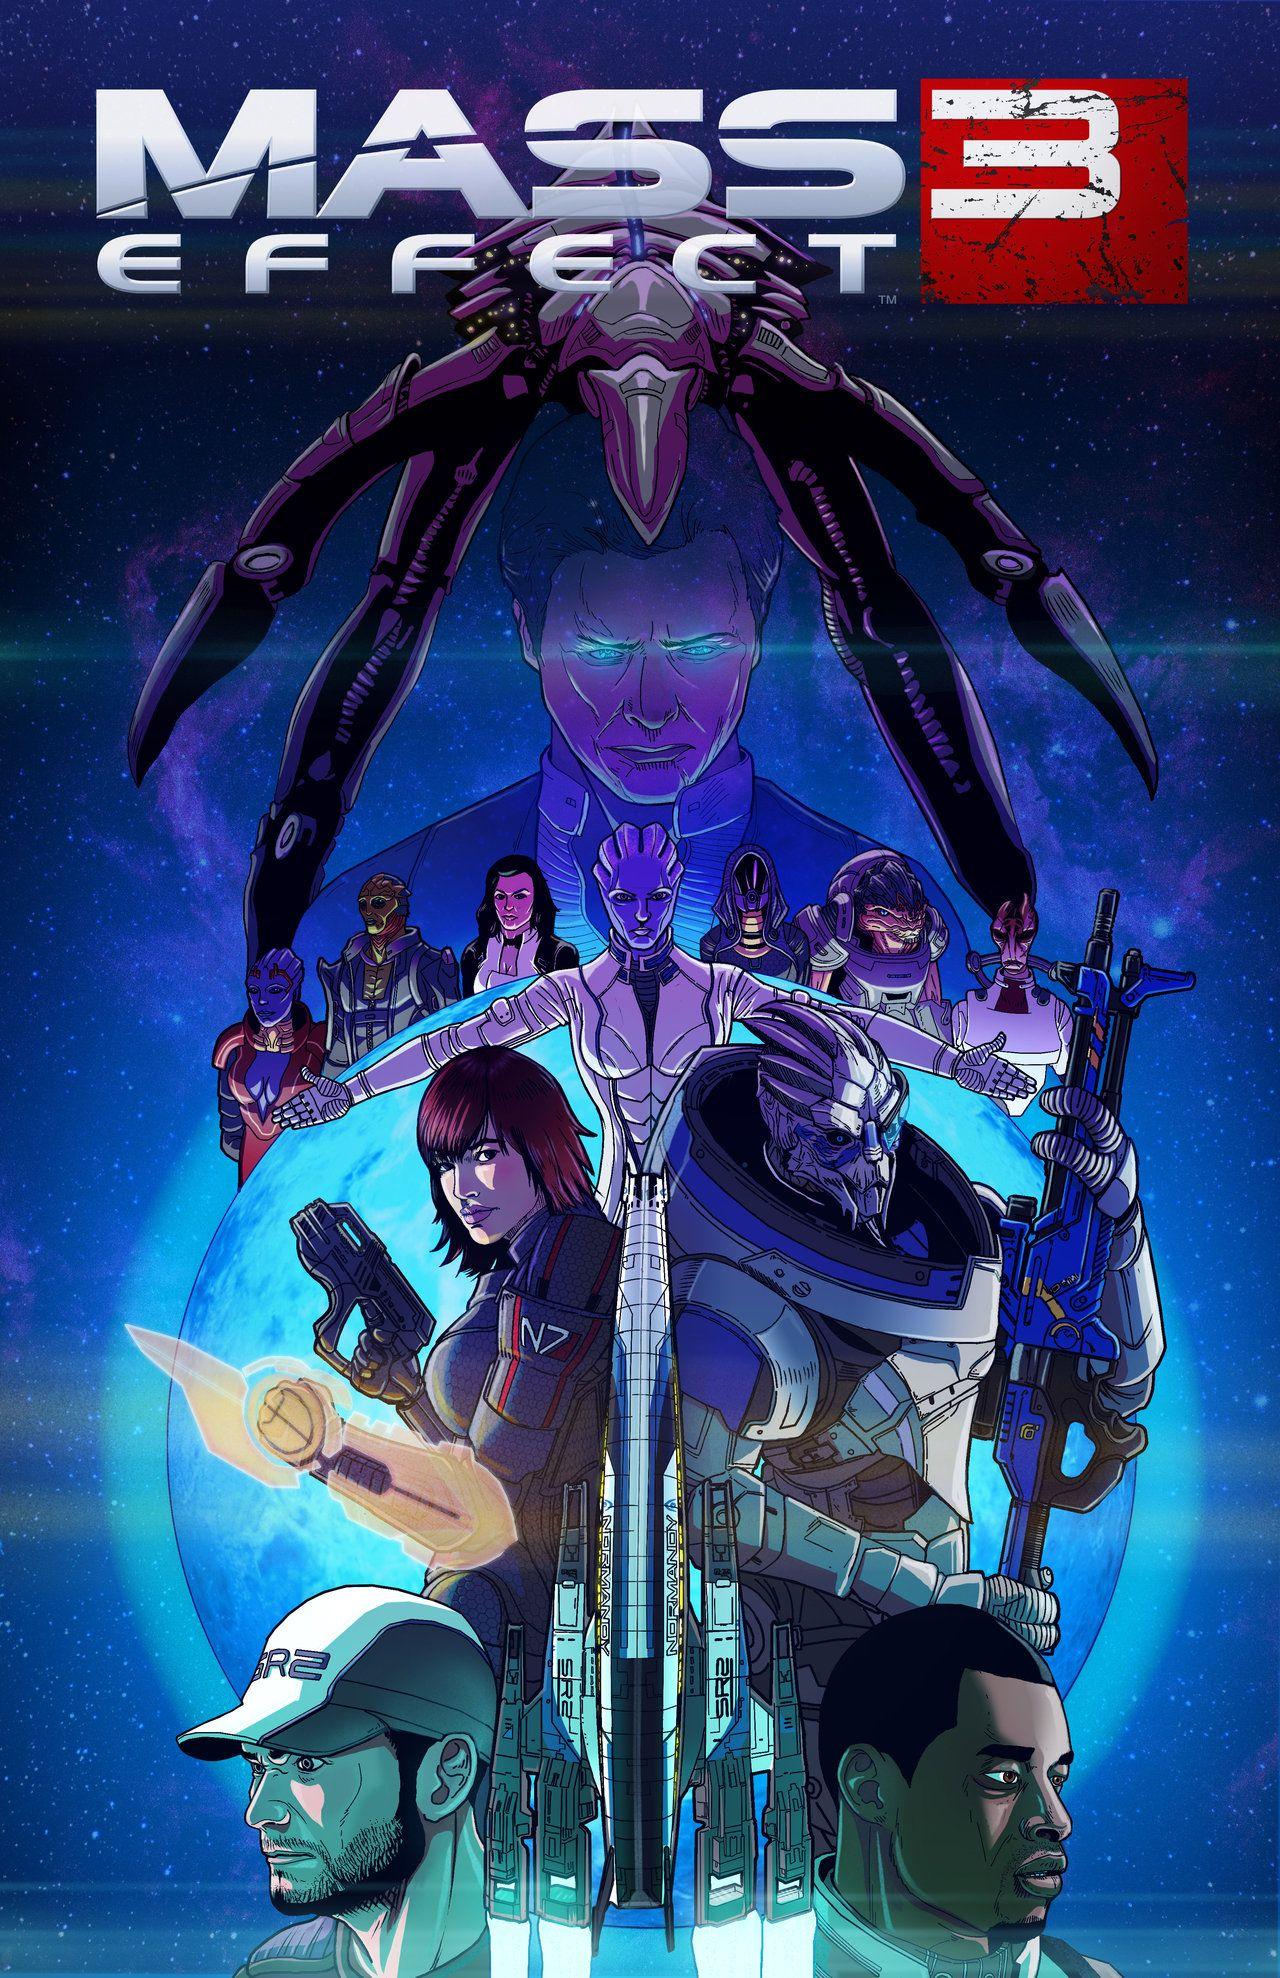 STARD Mass Effect Cos Play Characters: Miranda, Jack and Samara.